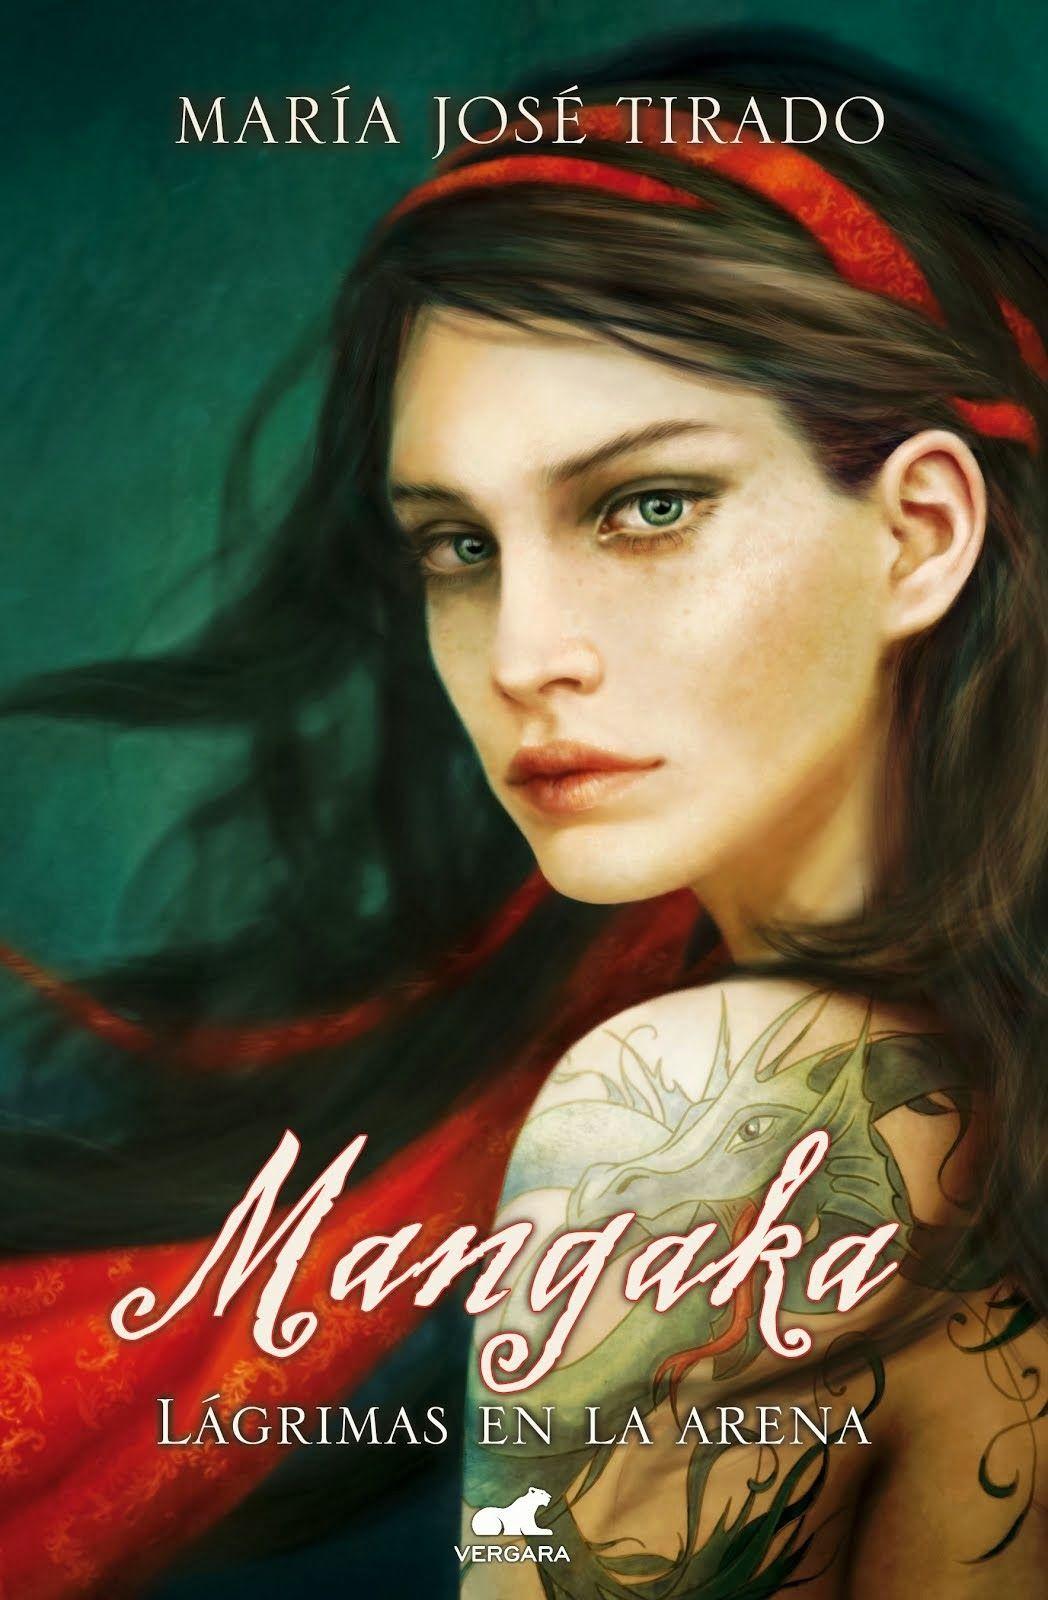 Reseña-Mangaka